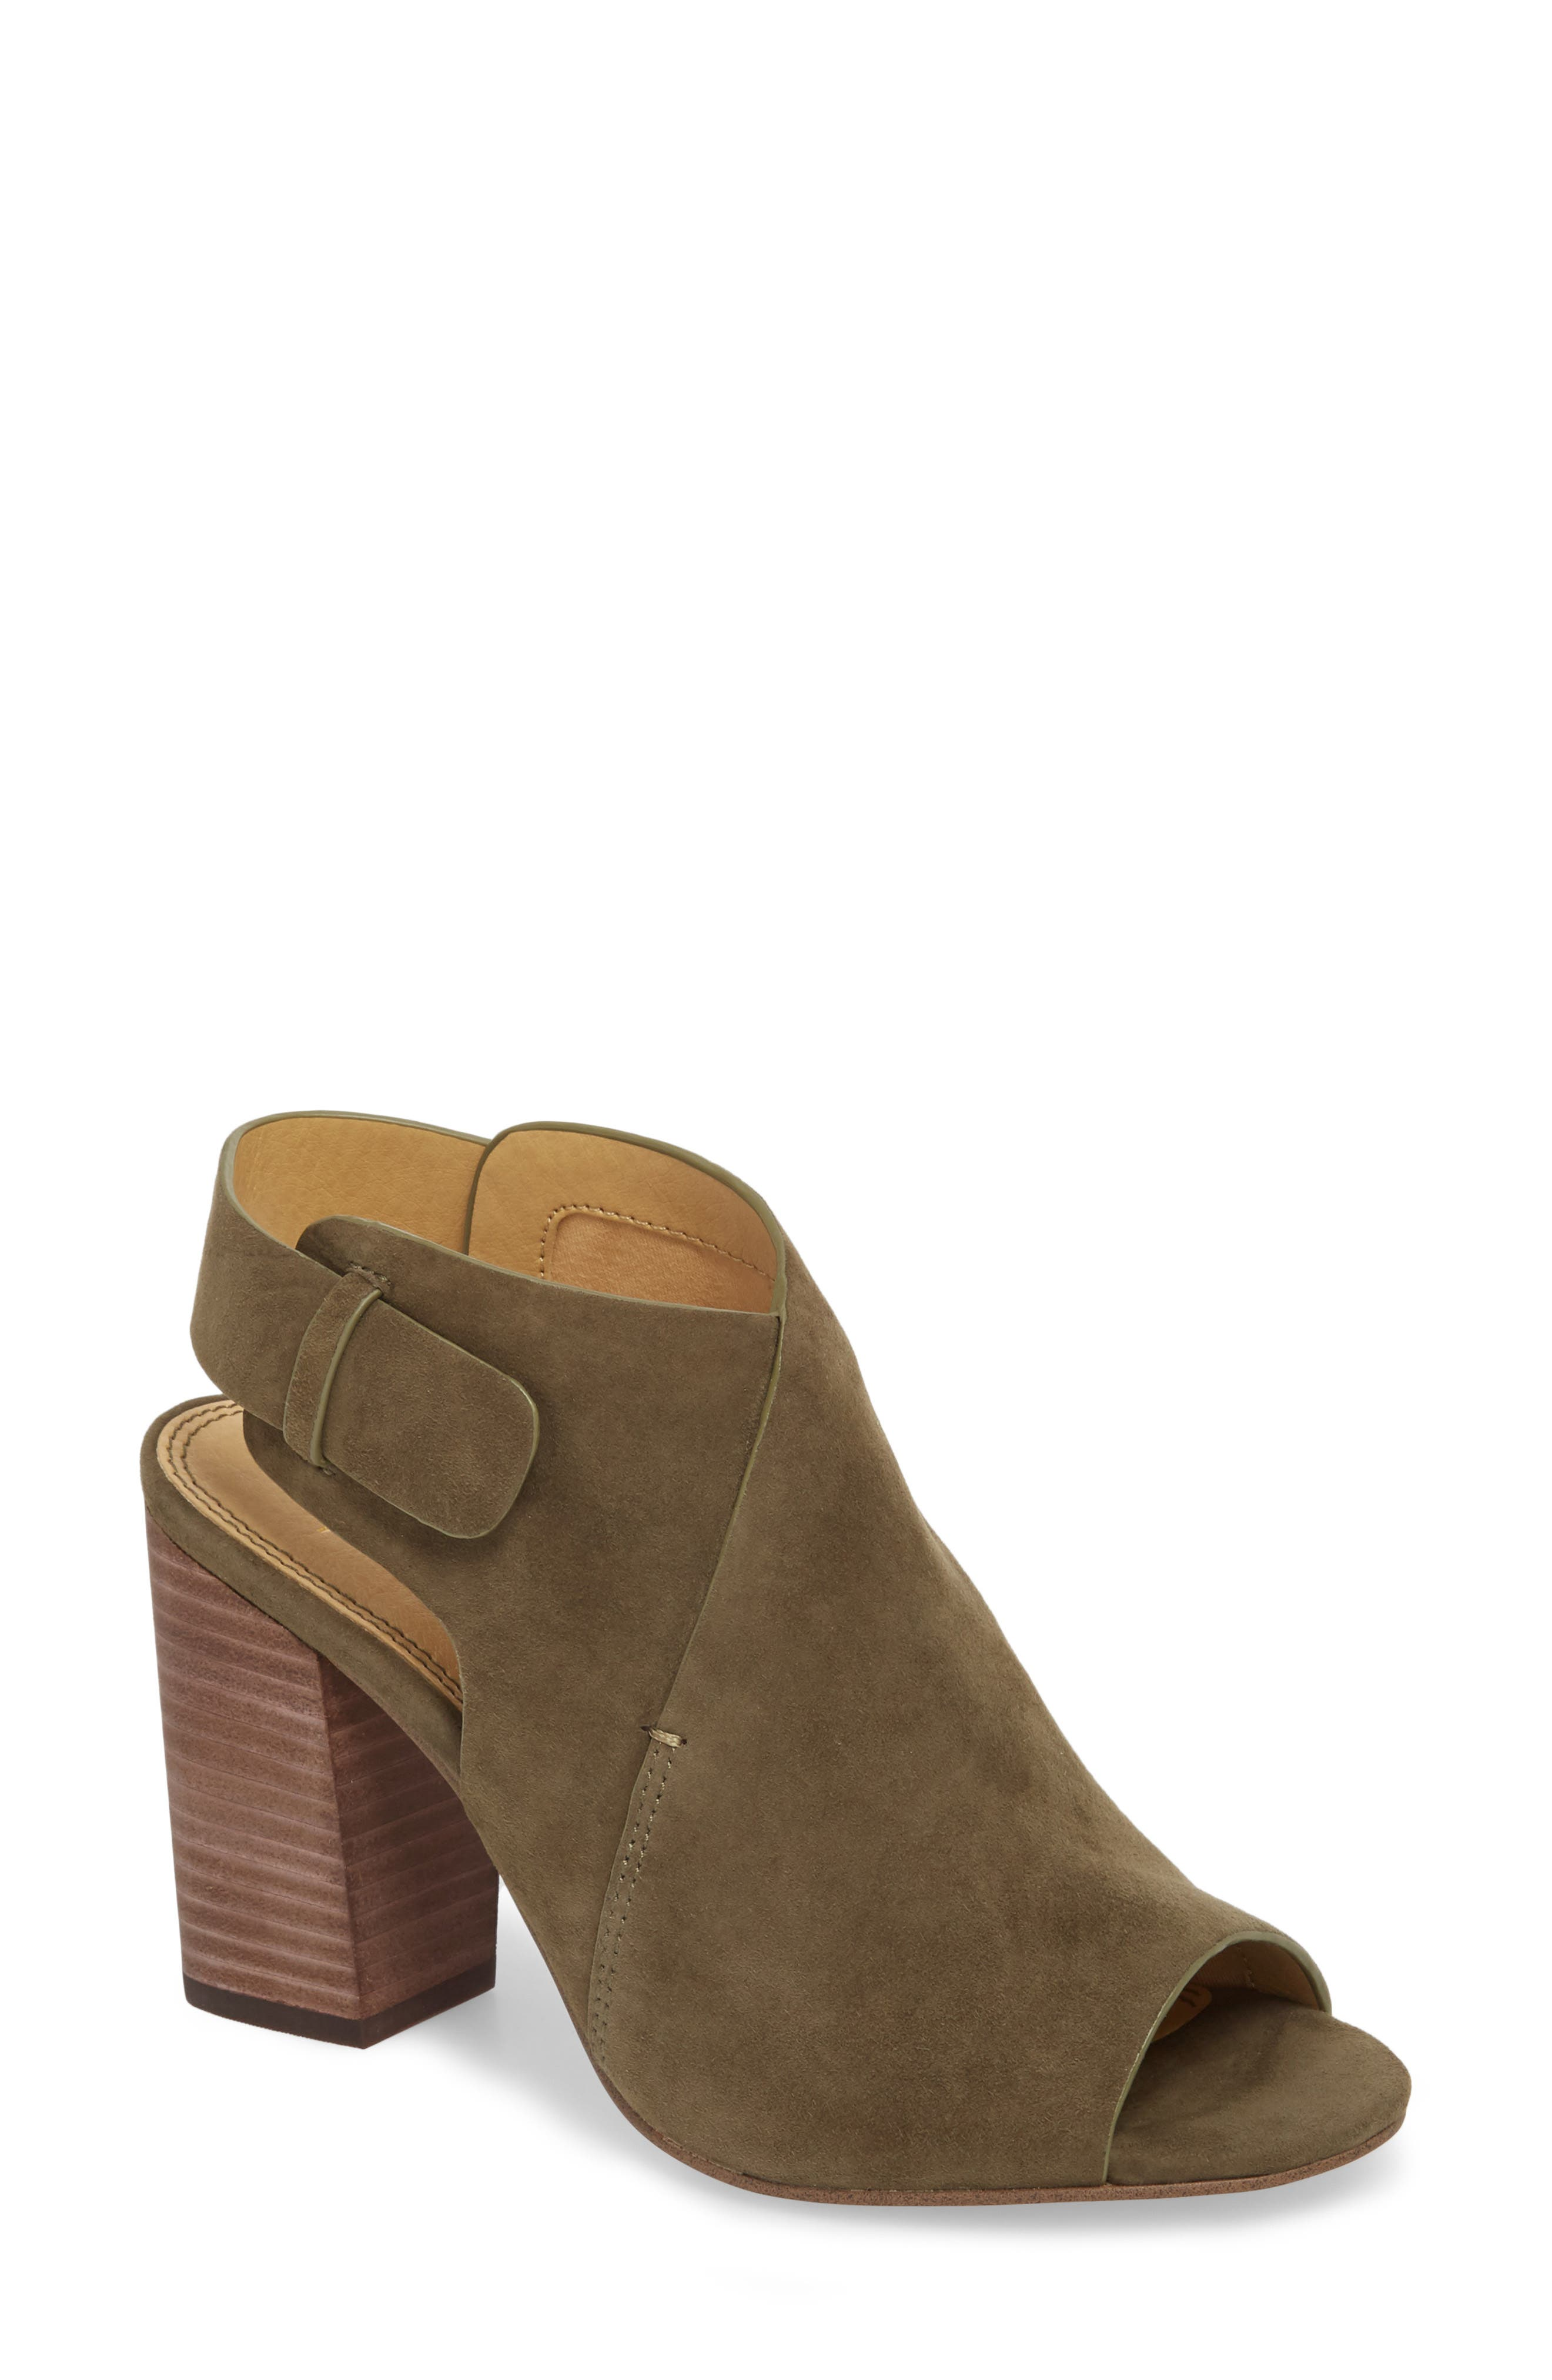 Nikolai Stack Heel Sandal,                             Main thumbnail 1, color,                             Olive Suede